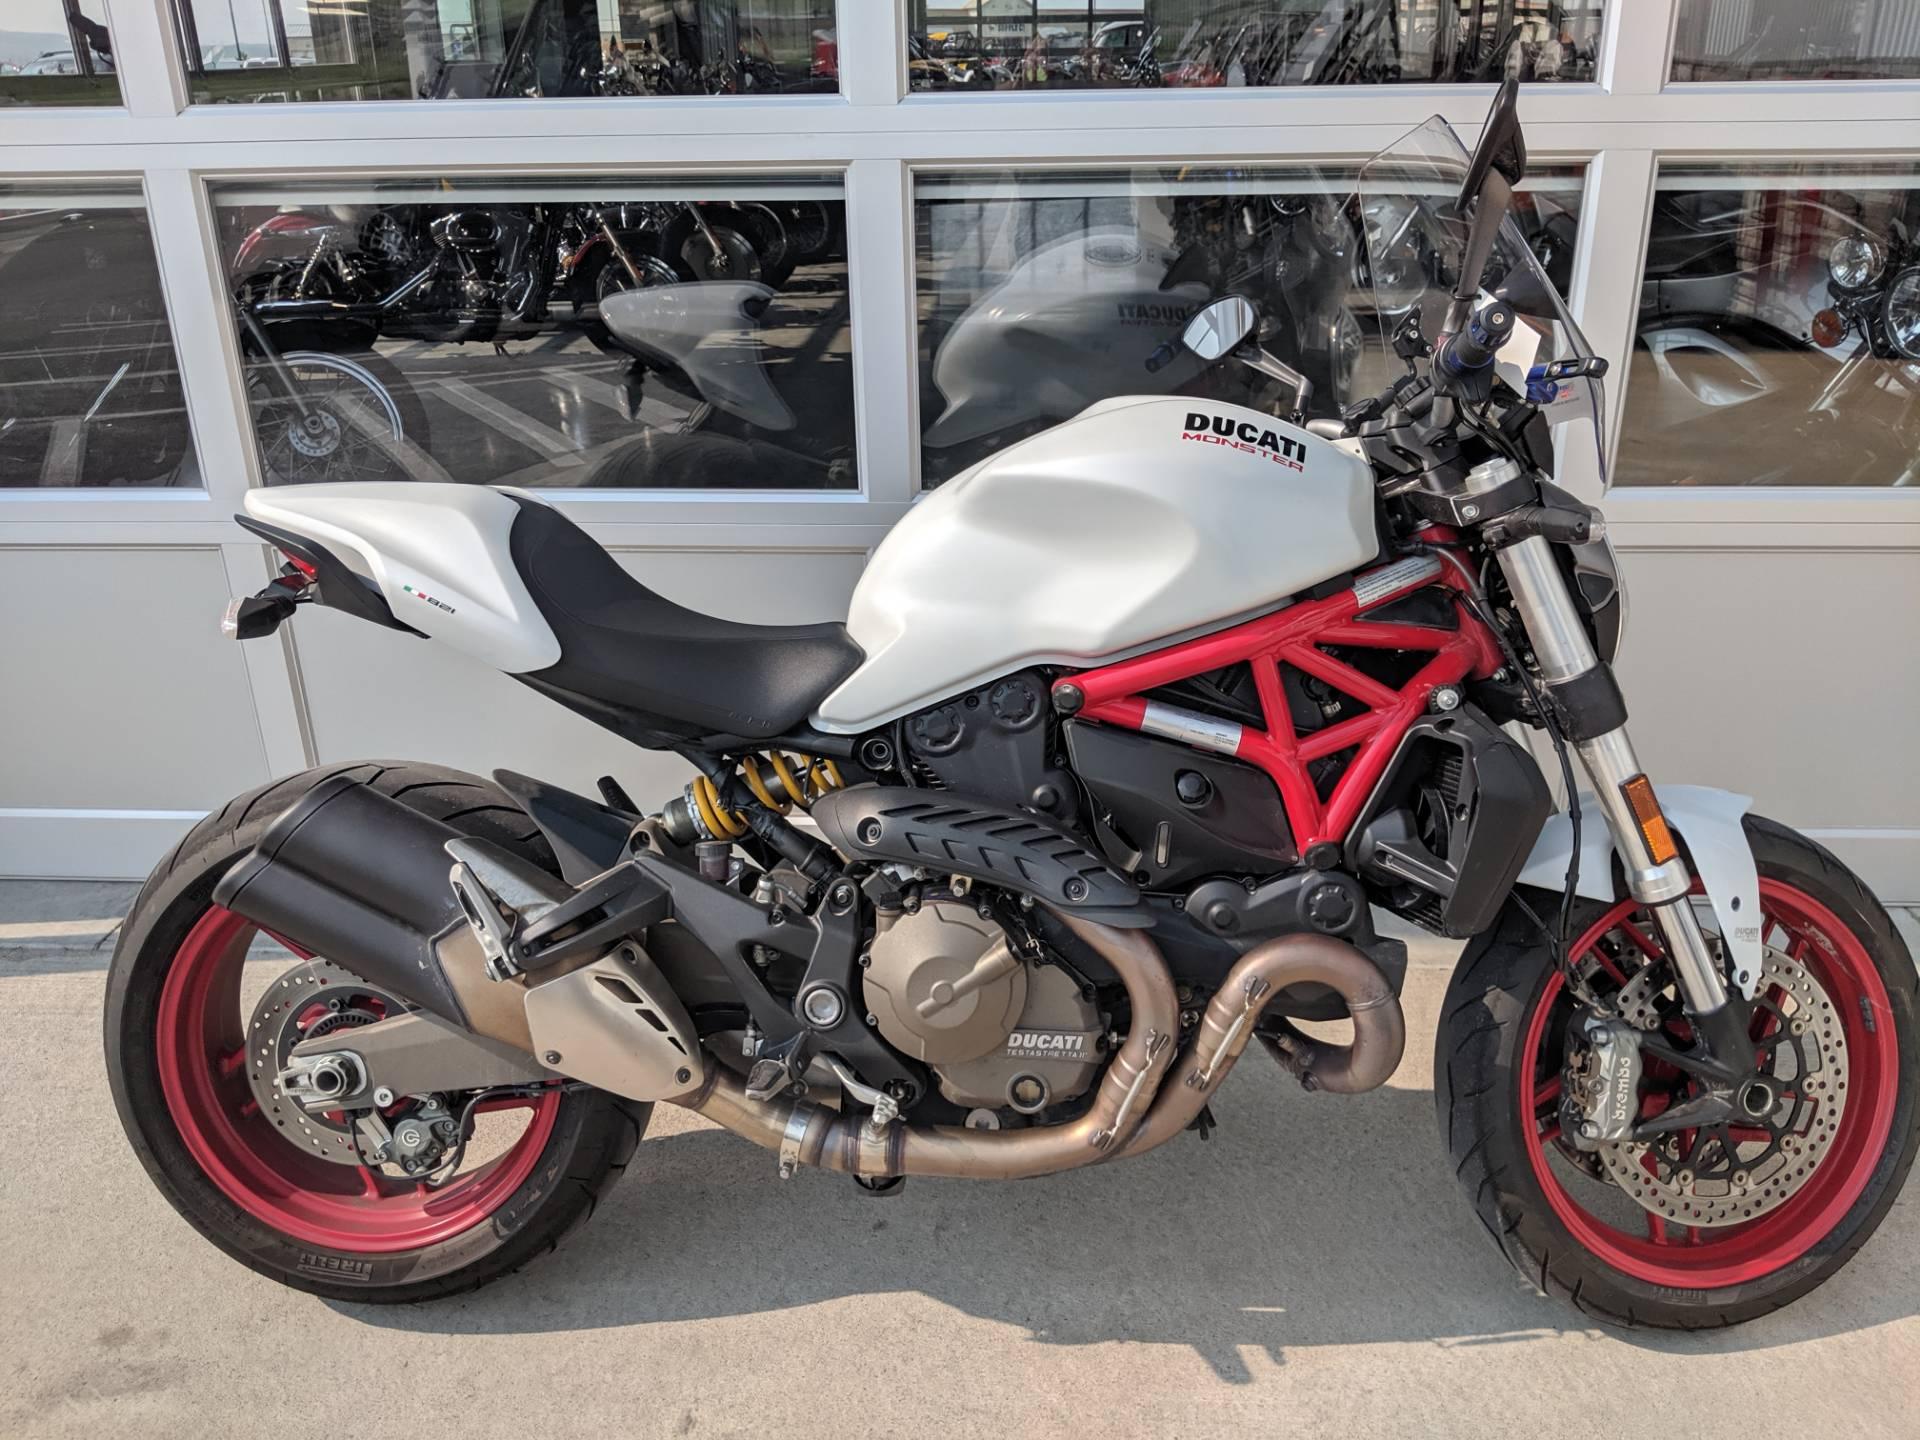 Ducati Monster 821 >> 2015 Ducati Monster 821 In Rapid City South Dakota